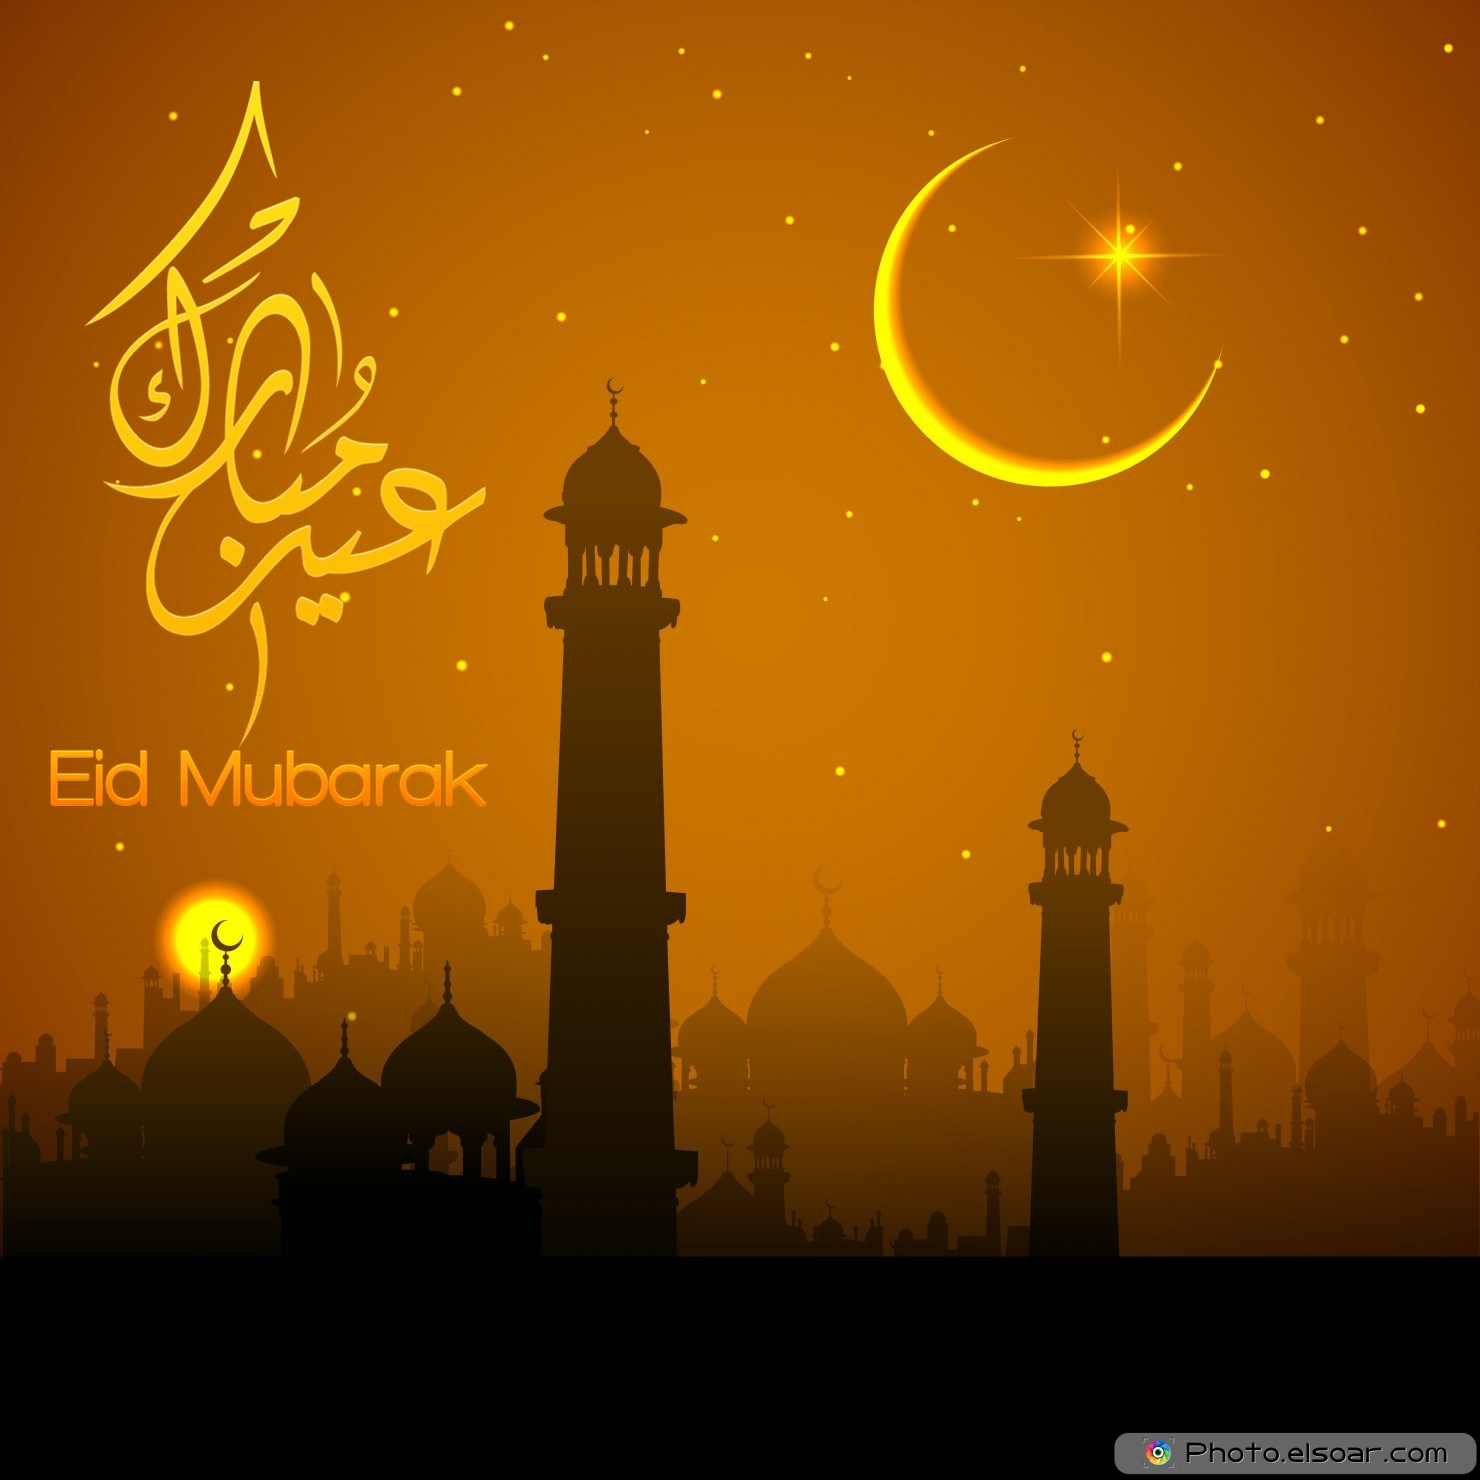 Popular Eid Mubarak Eid Al-Fitr 2018 - Eid-Ul-Fitr-2017-Whatsapp-DP  2018_85511 .jpg